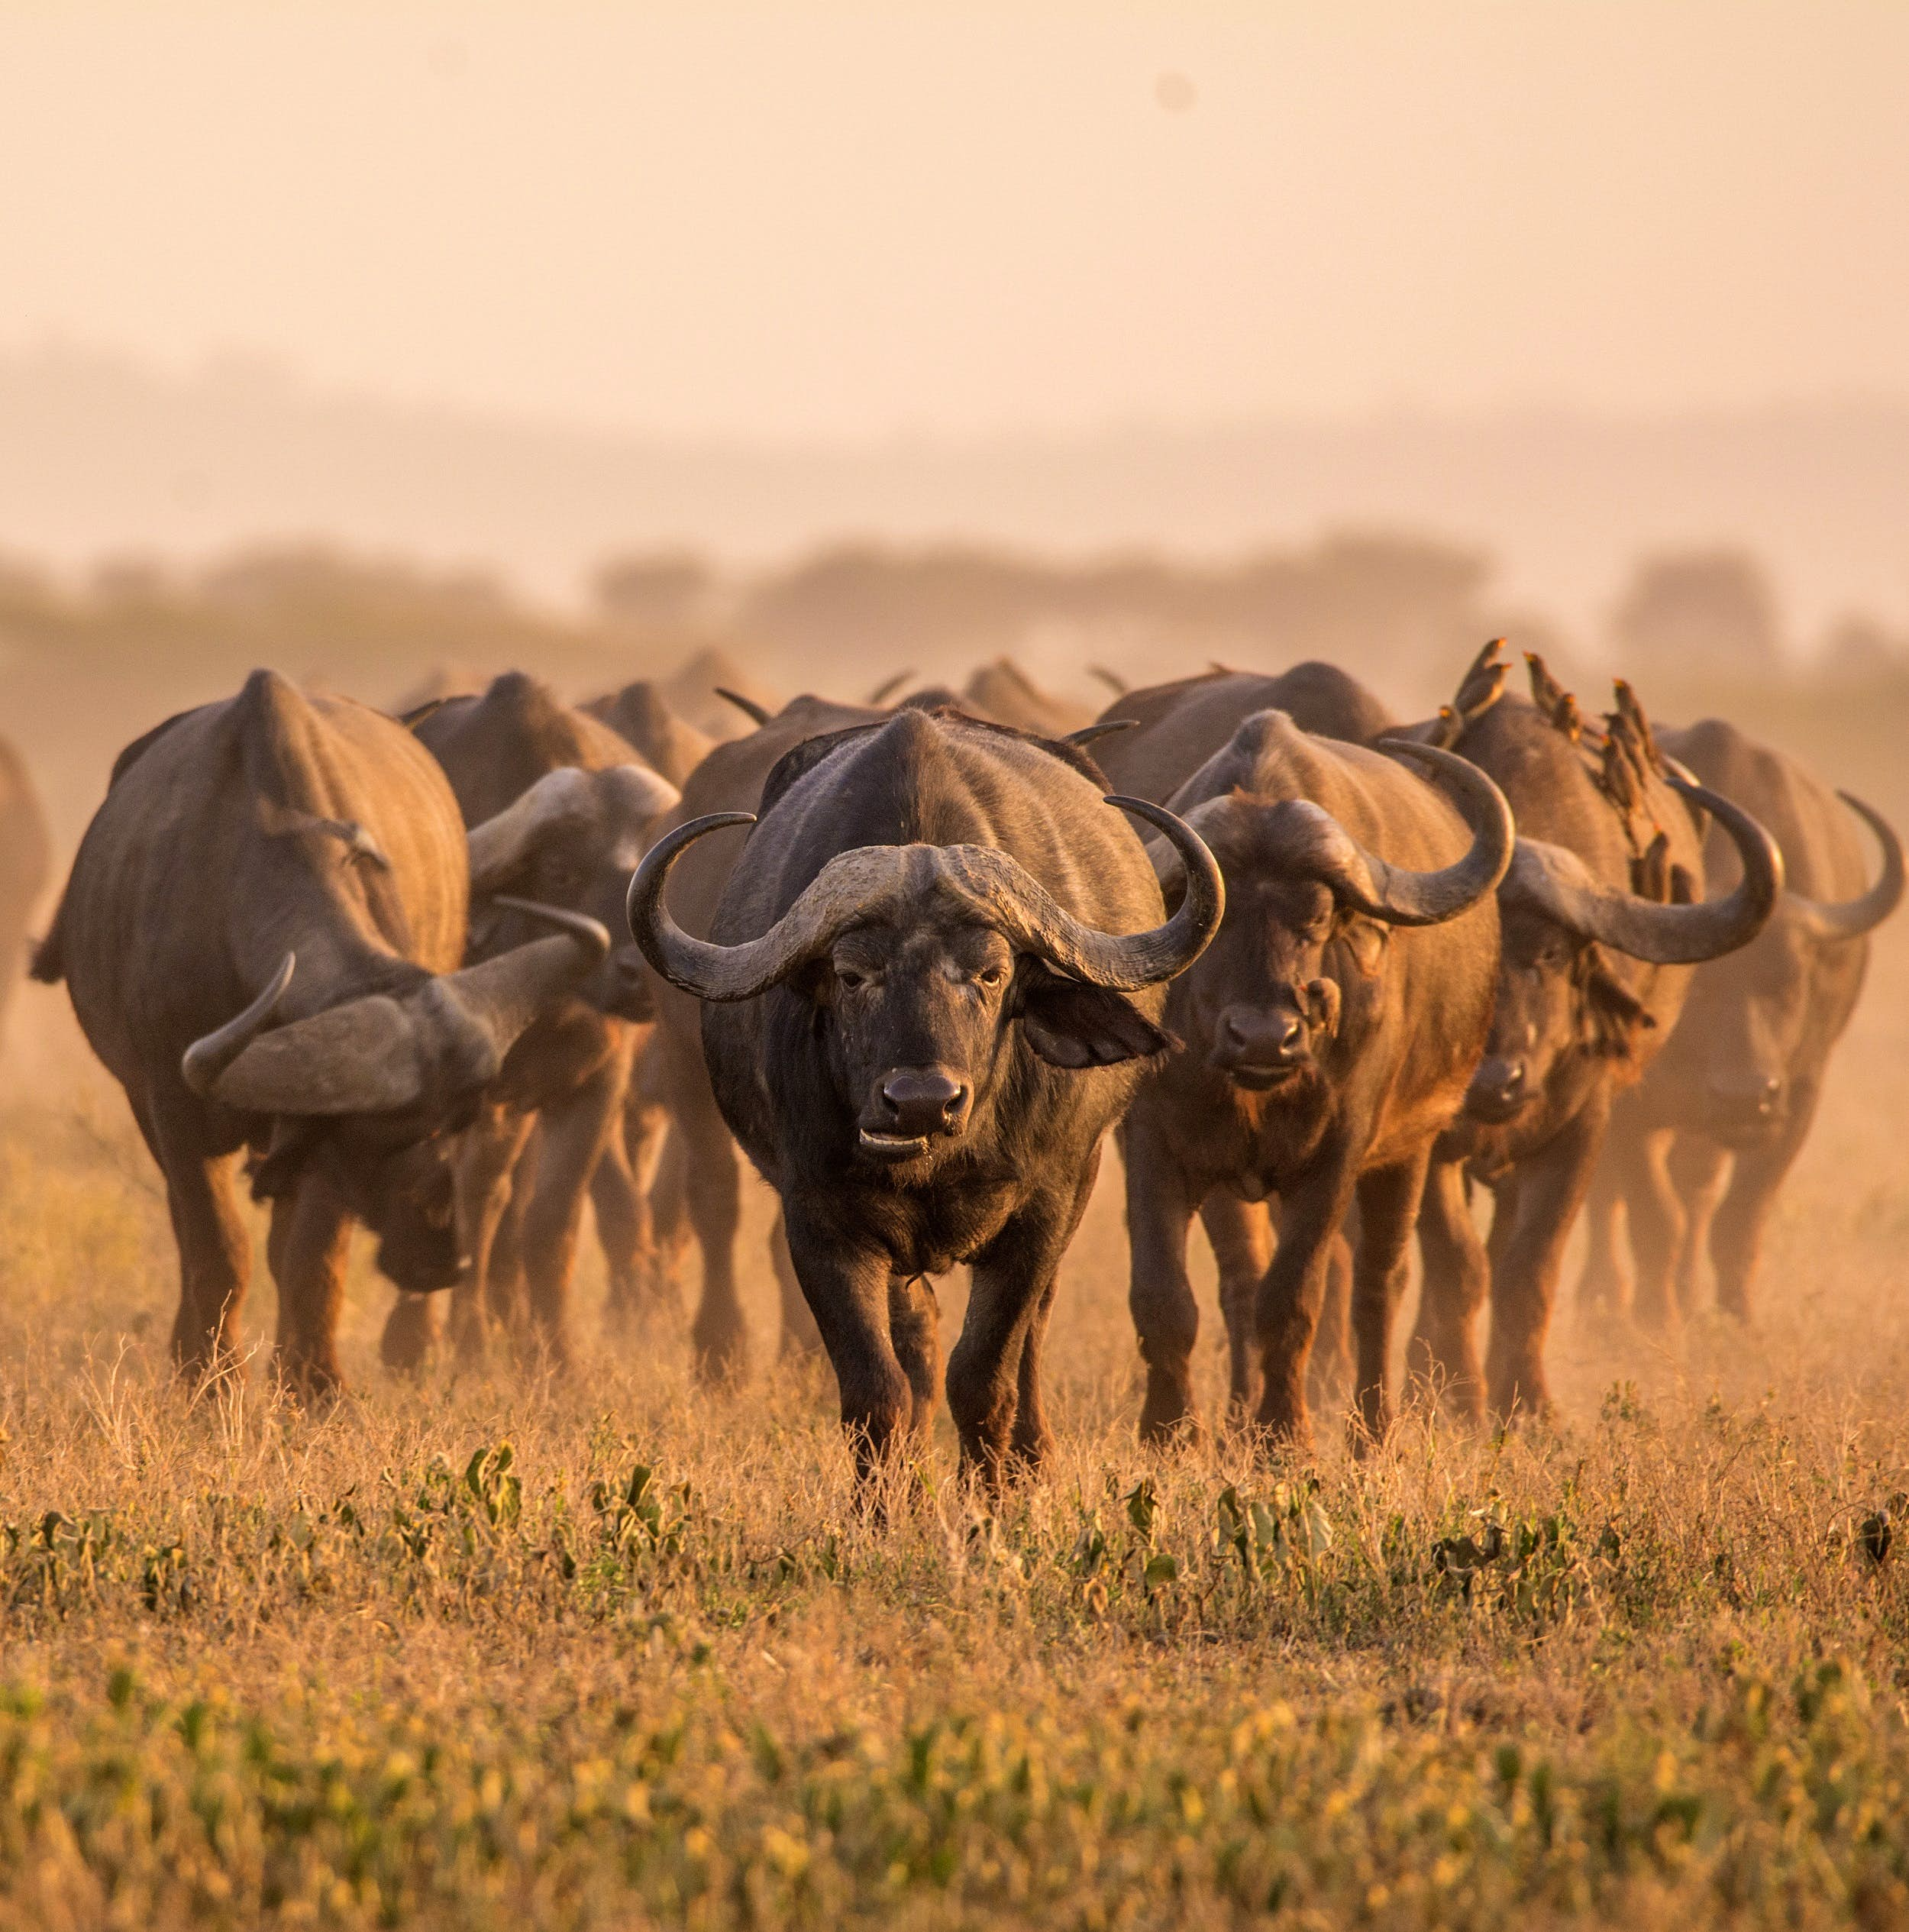 A large herd of buffalo walk towards the camera on a dusty savannah.